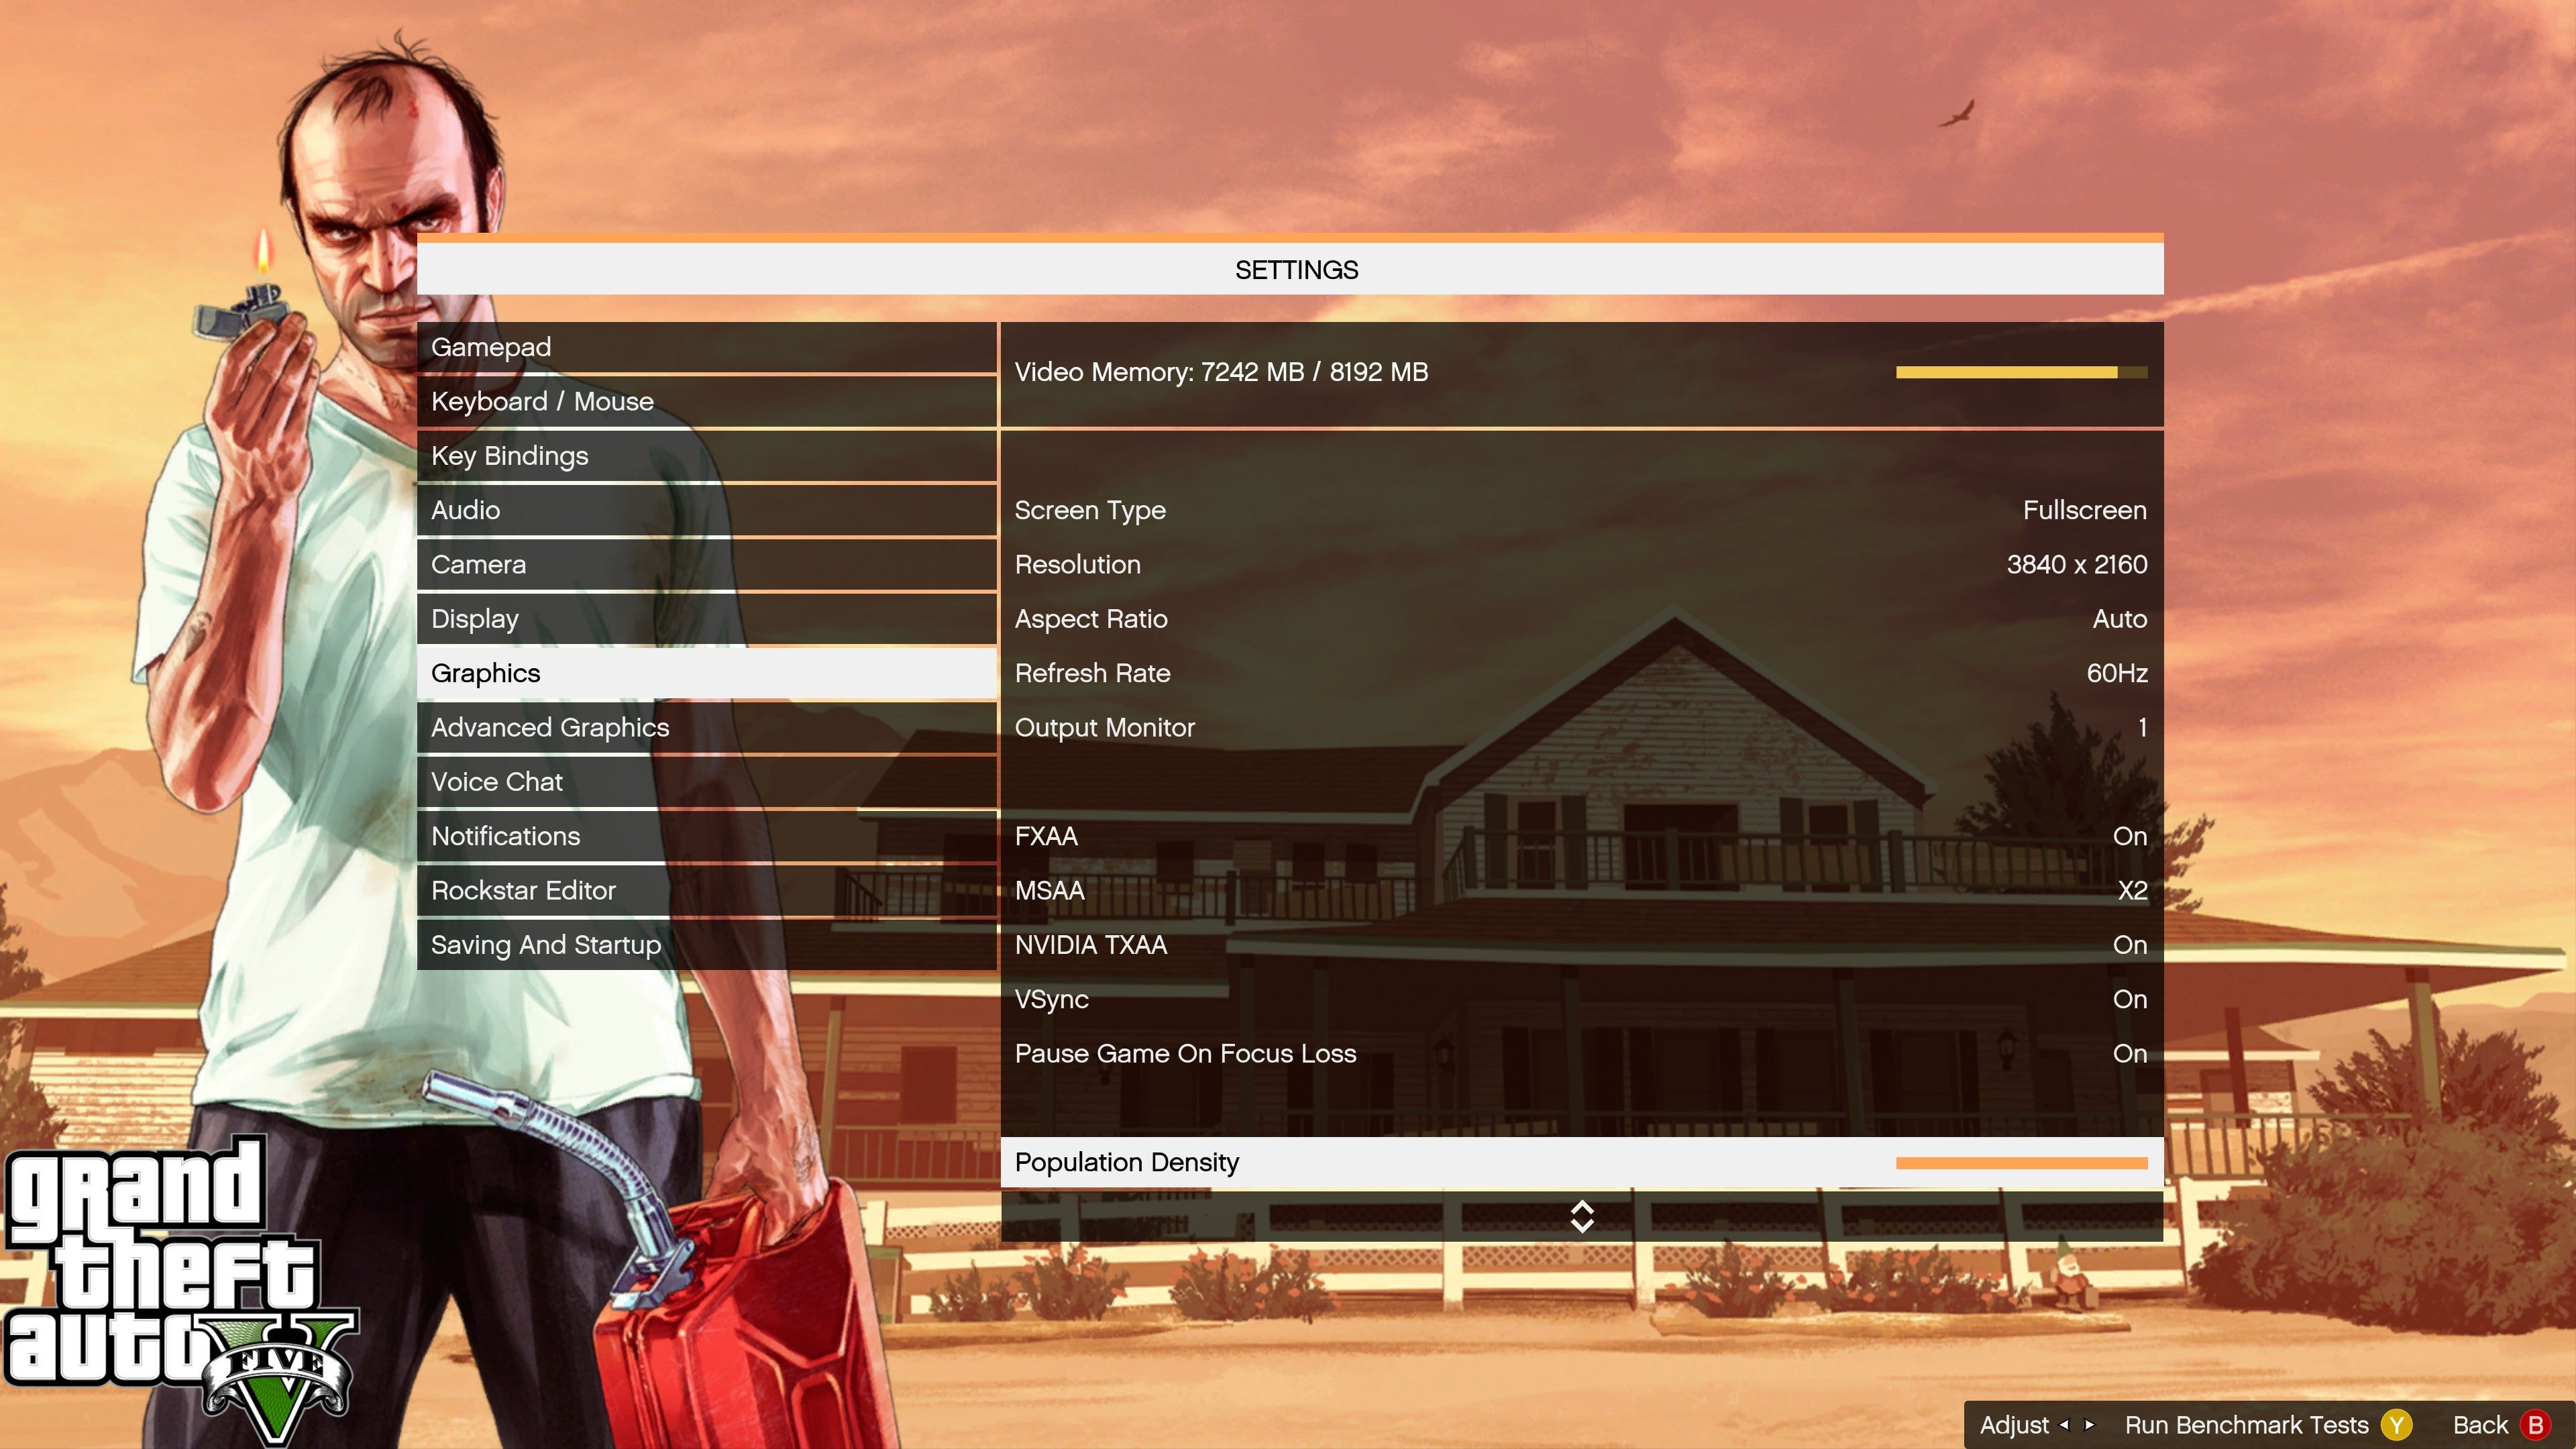 GTA V PC Runs Pretty Well In Ultra HD, If You've Got The Hardware